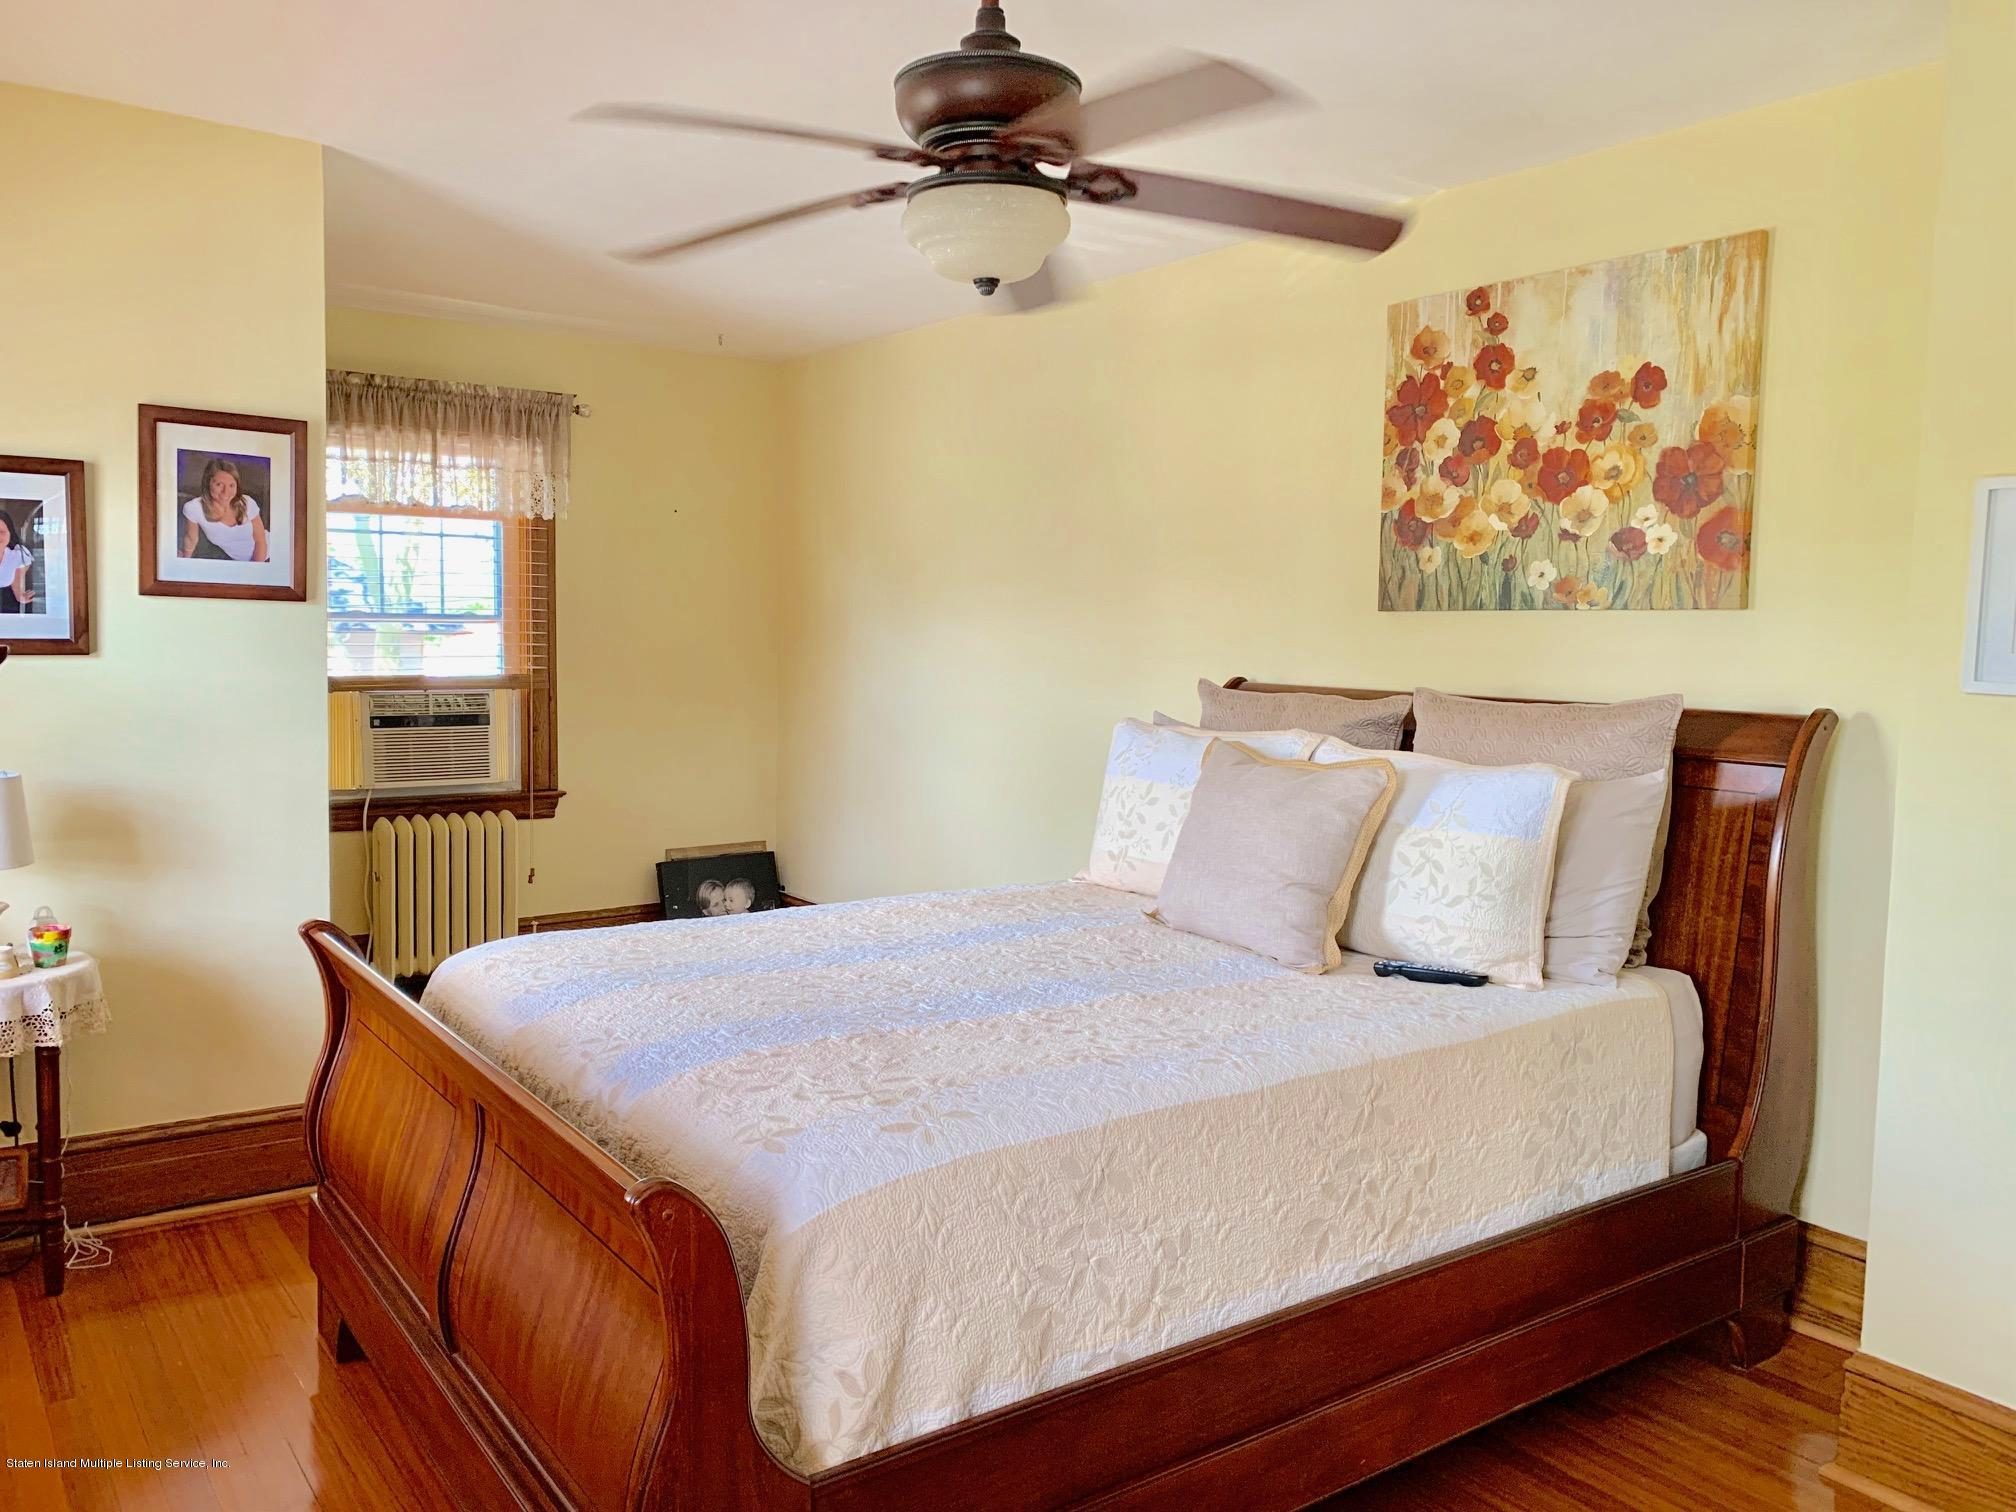 Single Family - Detached 195 Fairview Avenue  Staten Island, NY 10314, MLS-1132423-23